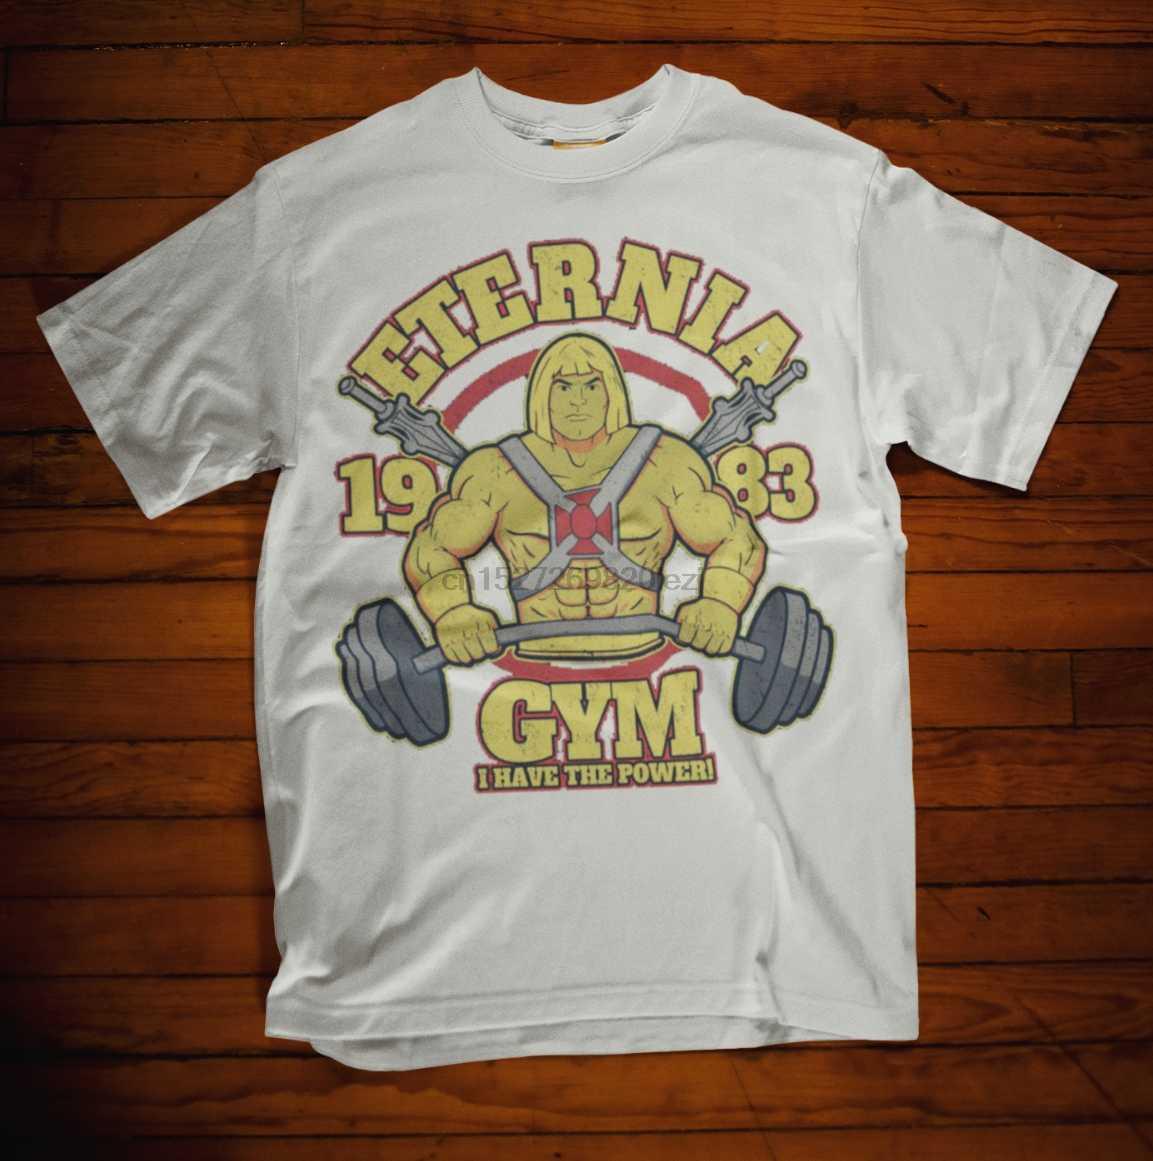 He Man Футболка Eternia Gym power tv Skeletor тренировочная футболка 80s 90s